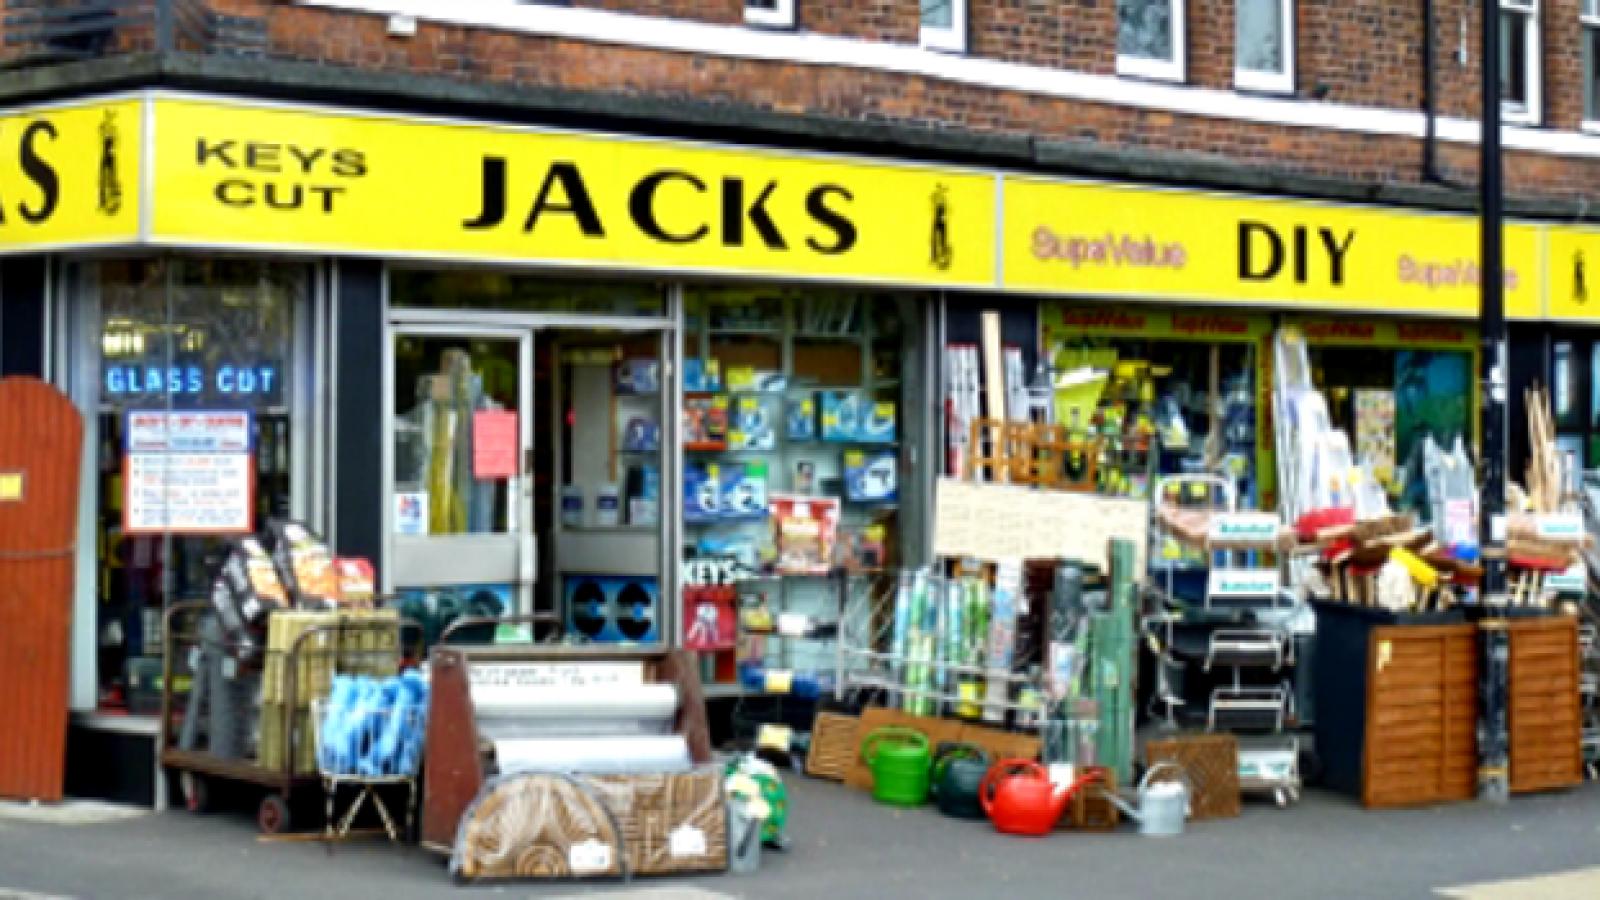 jacks-shop-pics-cropped-002